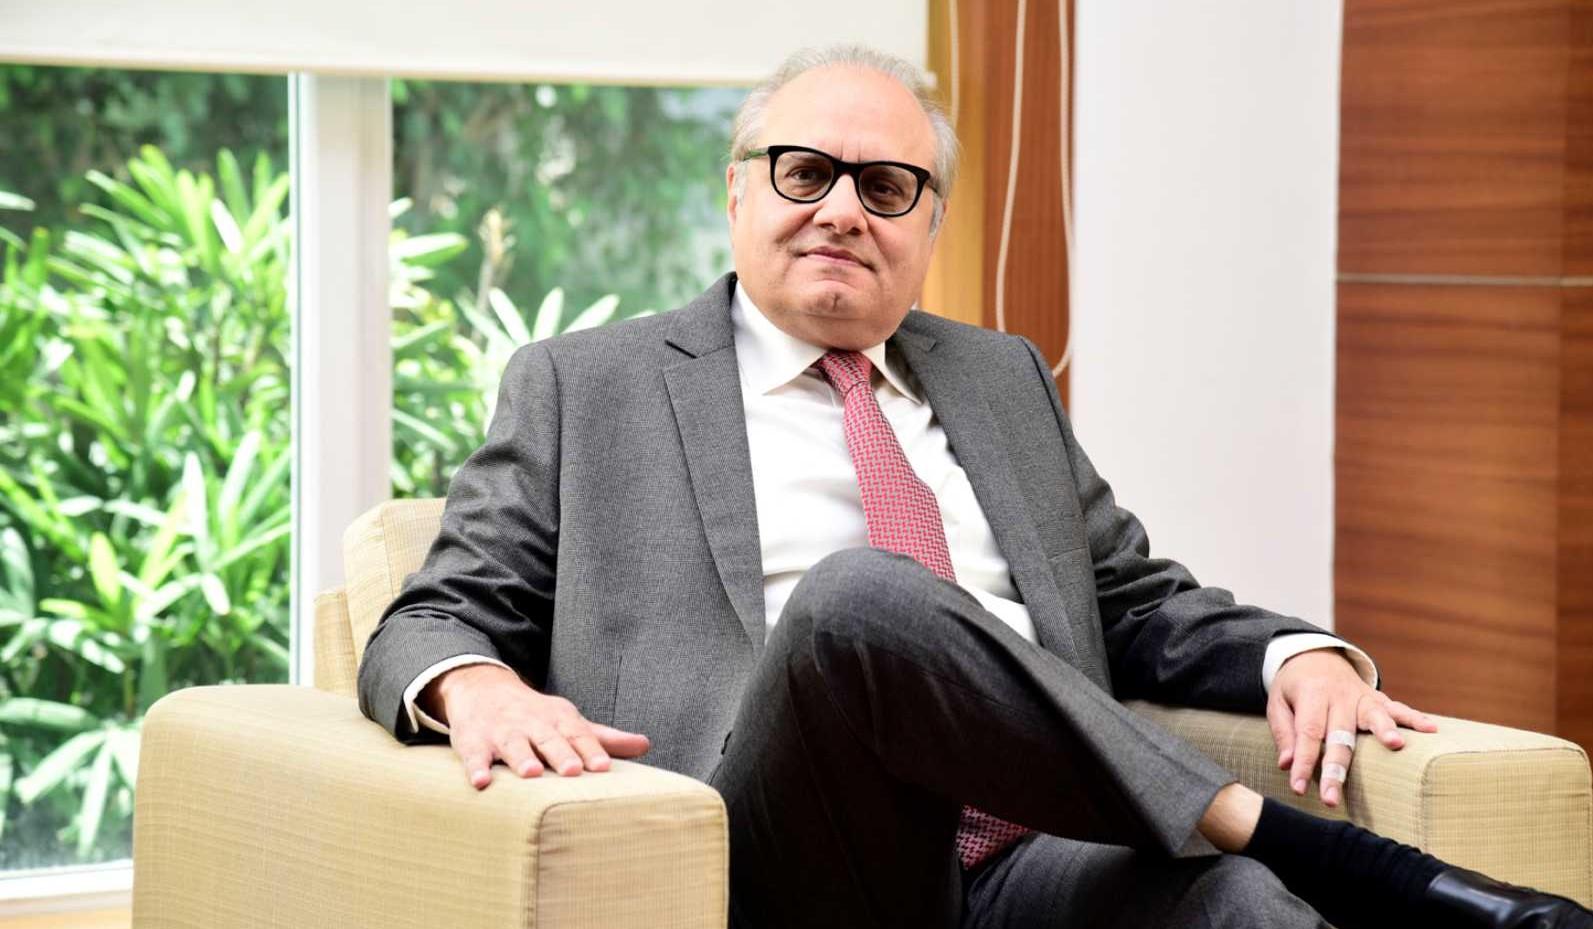 Mr. Rummy Chhabra